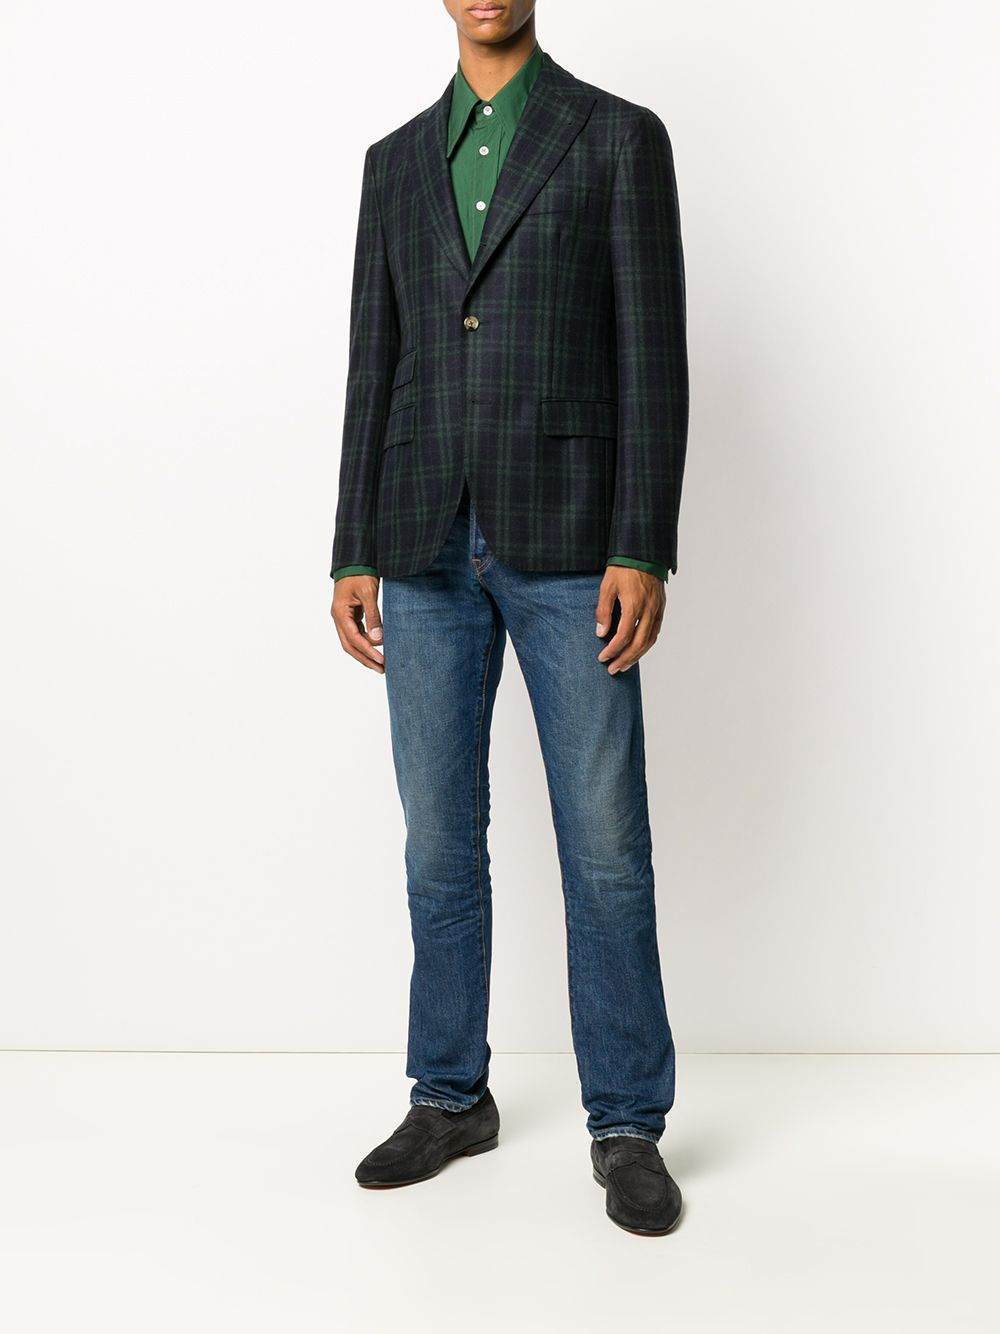 Blazer a quadri scozzesi in lana blu e verde con revers a lancia ELEVENTY | Giacche | B70GIAB04-TES0B03111